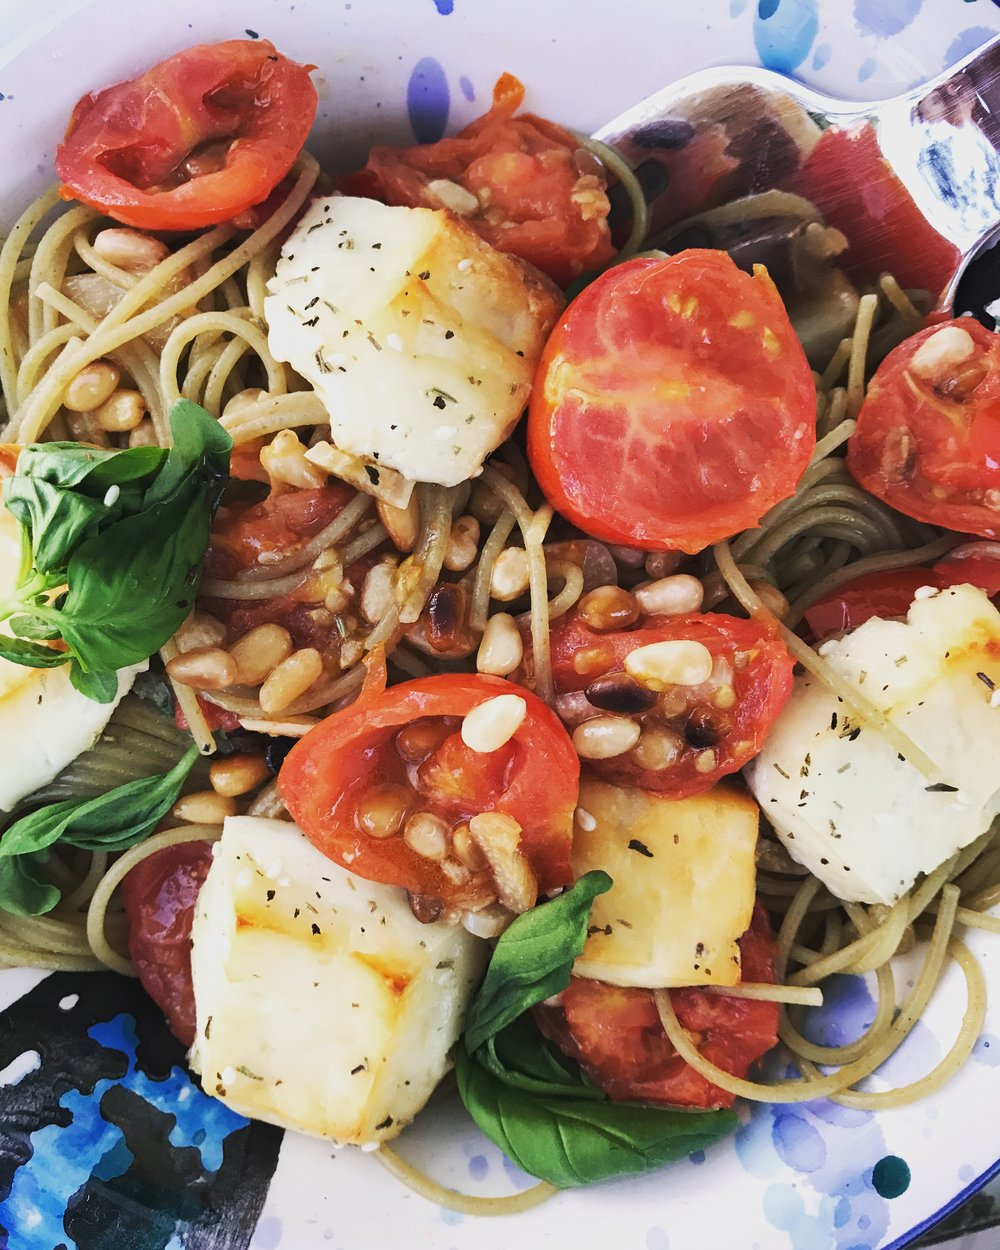 Spaghetti integrale di grano duro, with cherry tomatoes, pine nuts,haloumi cheese and basil leaves